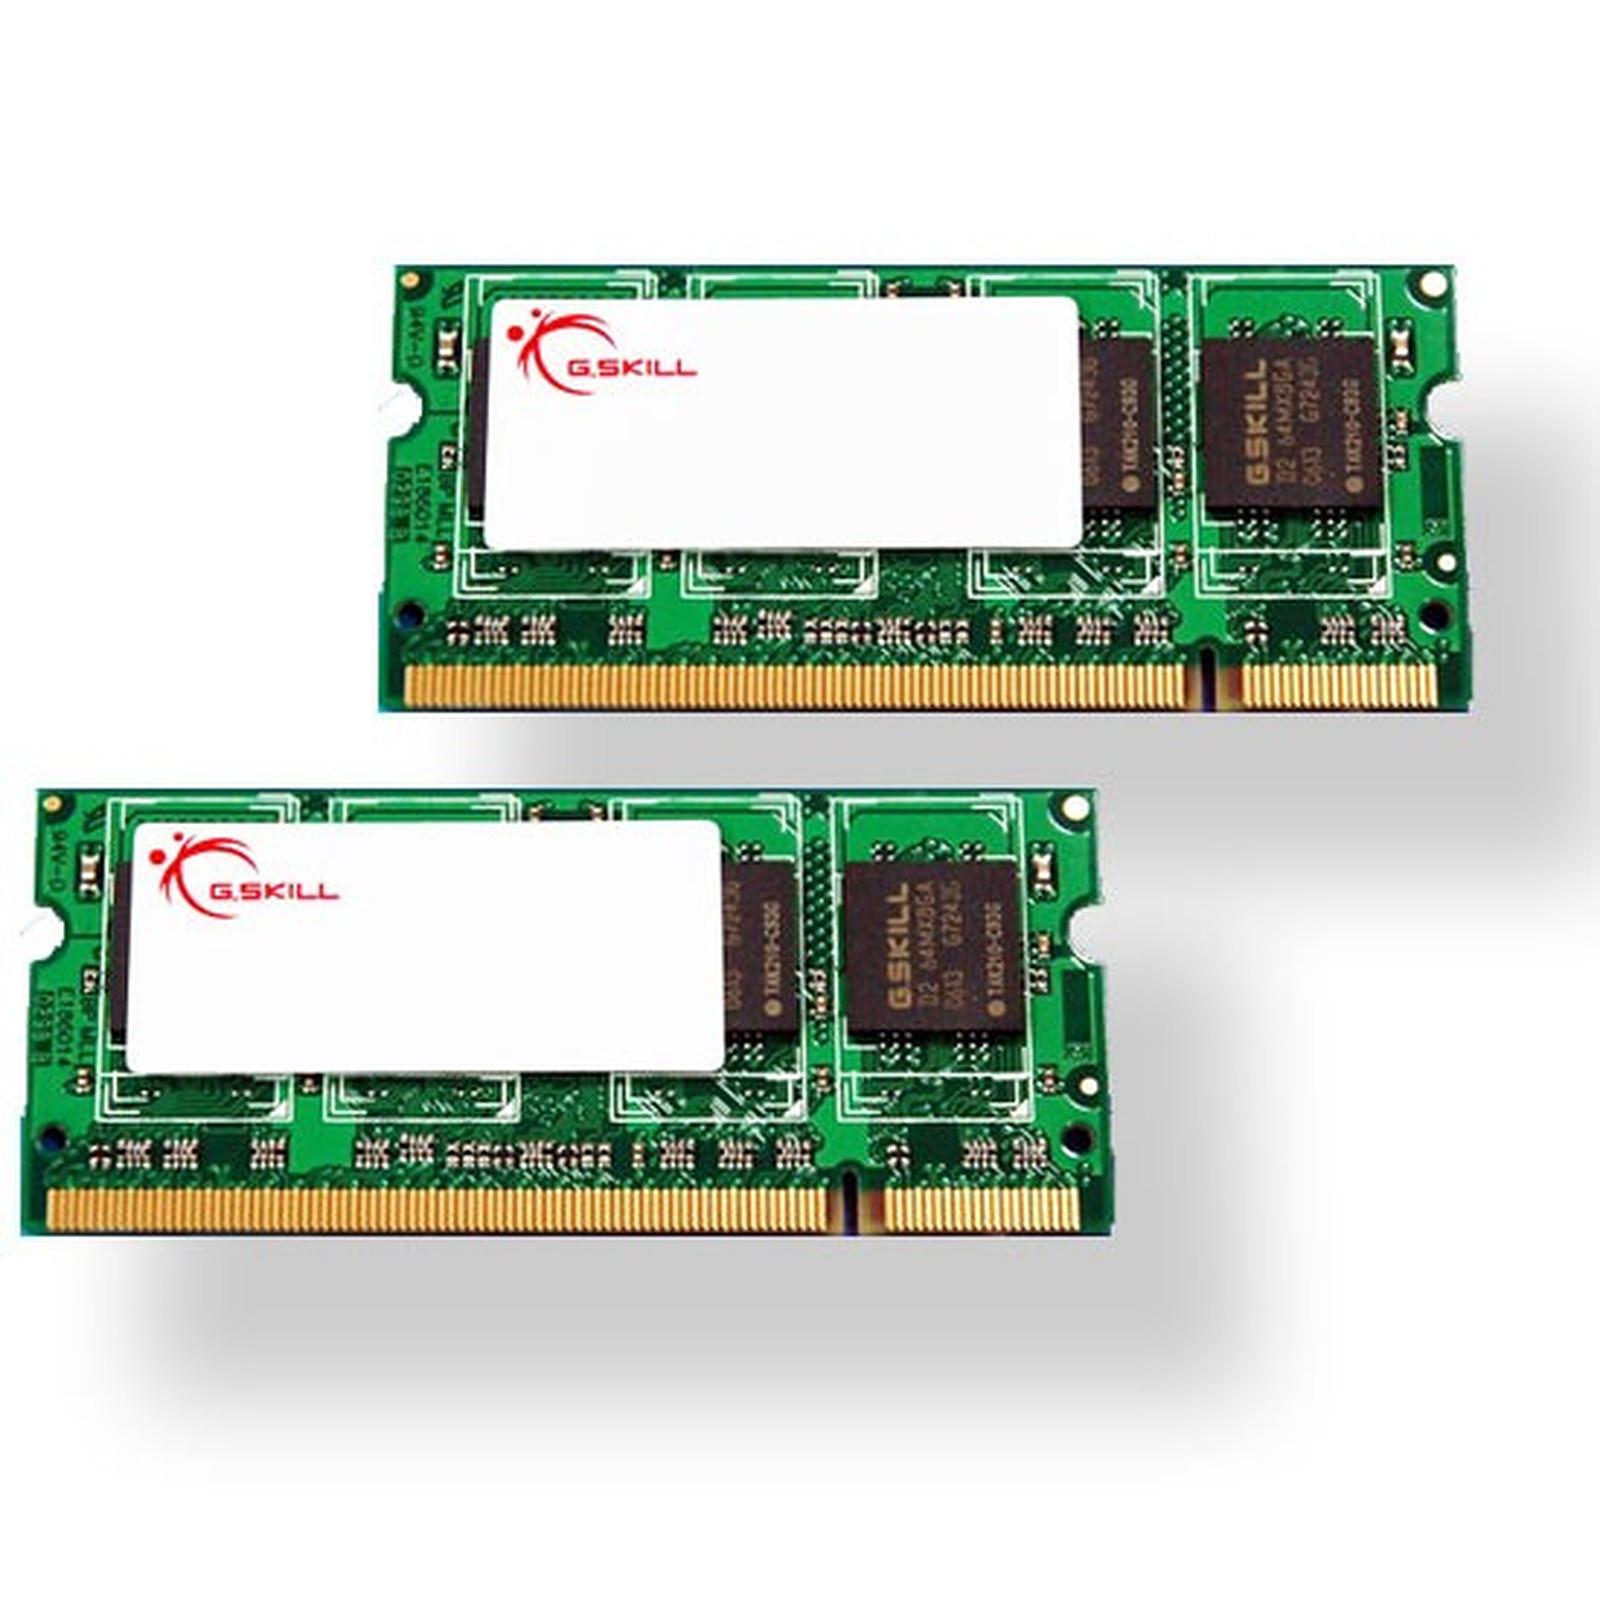 G.Skill SODIMM 4 Go (kit 2x 2 Go) DDR2-SDRAM PC2-5300 - F2-5300CL4D-4GBSQ